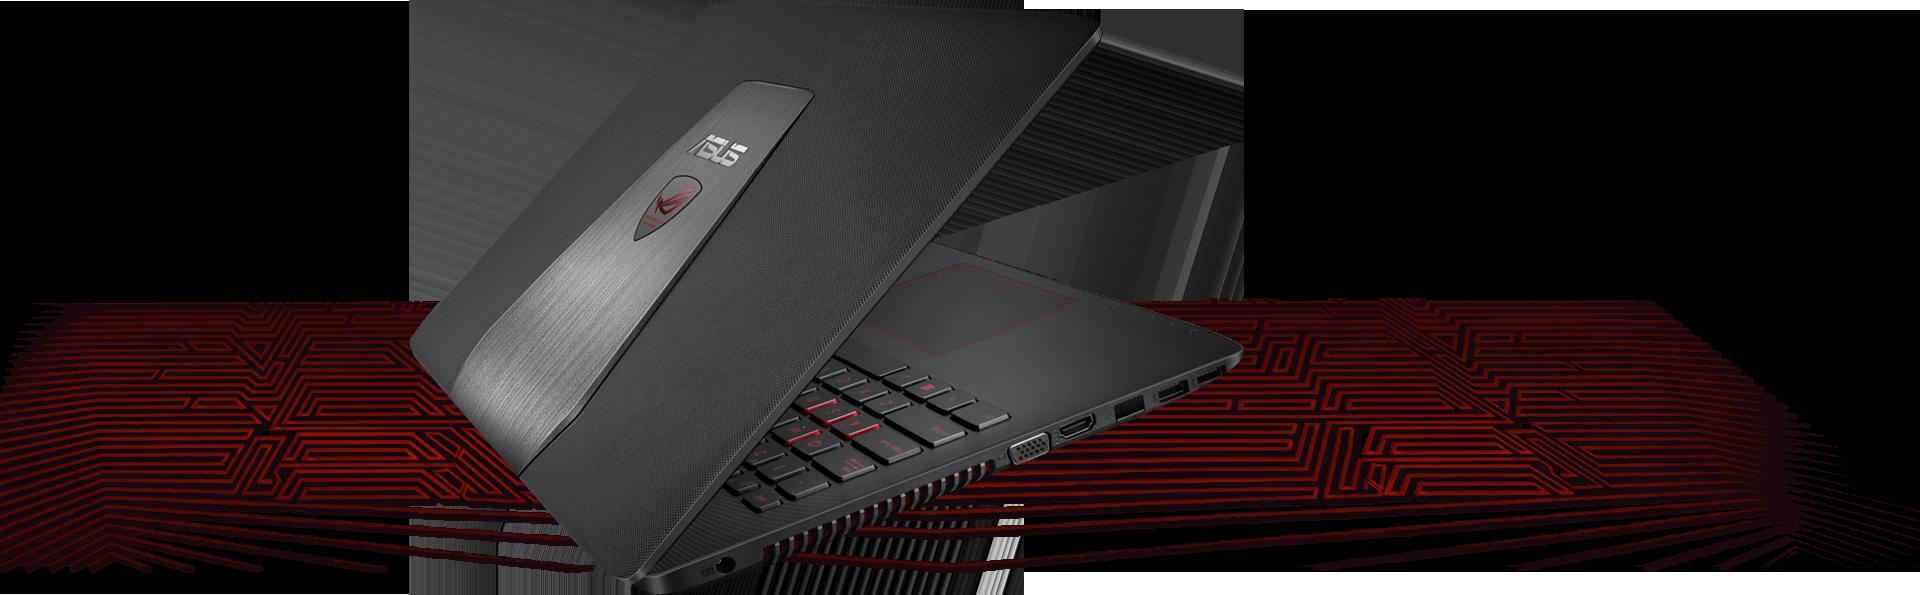 Asus ROG GL552J GL552JX GL552JX-DM033H Power supply Adapter laptop charger